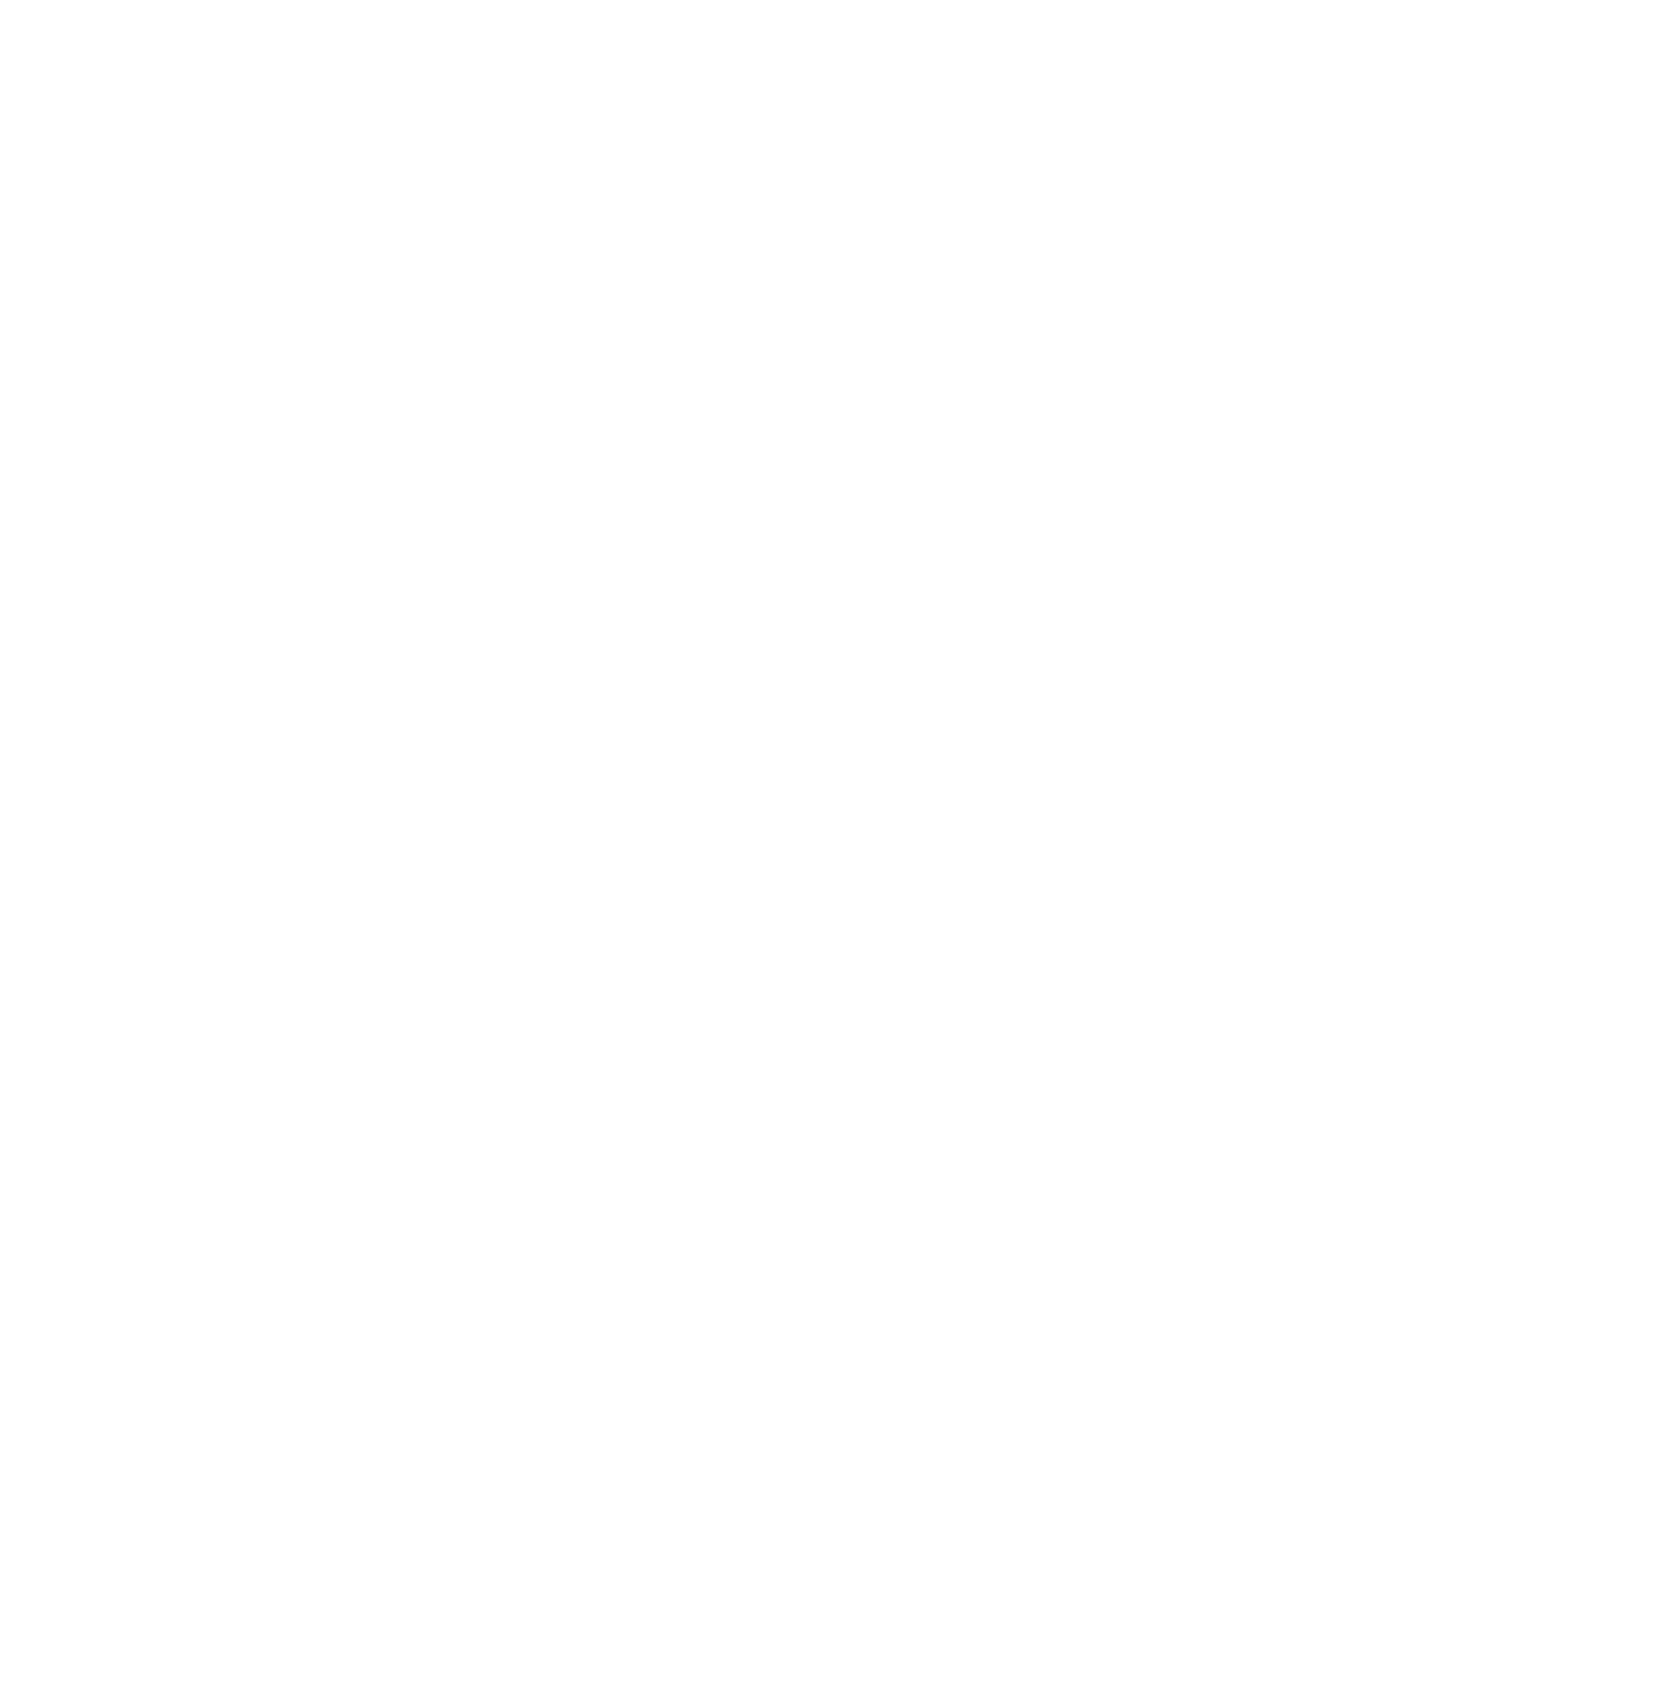 Dimitri Psihas Remax award Cambie member